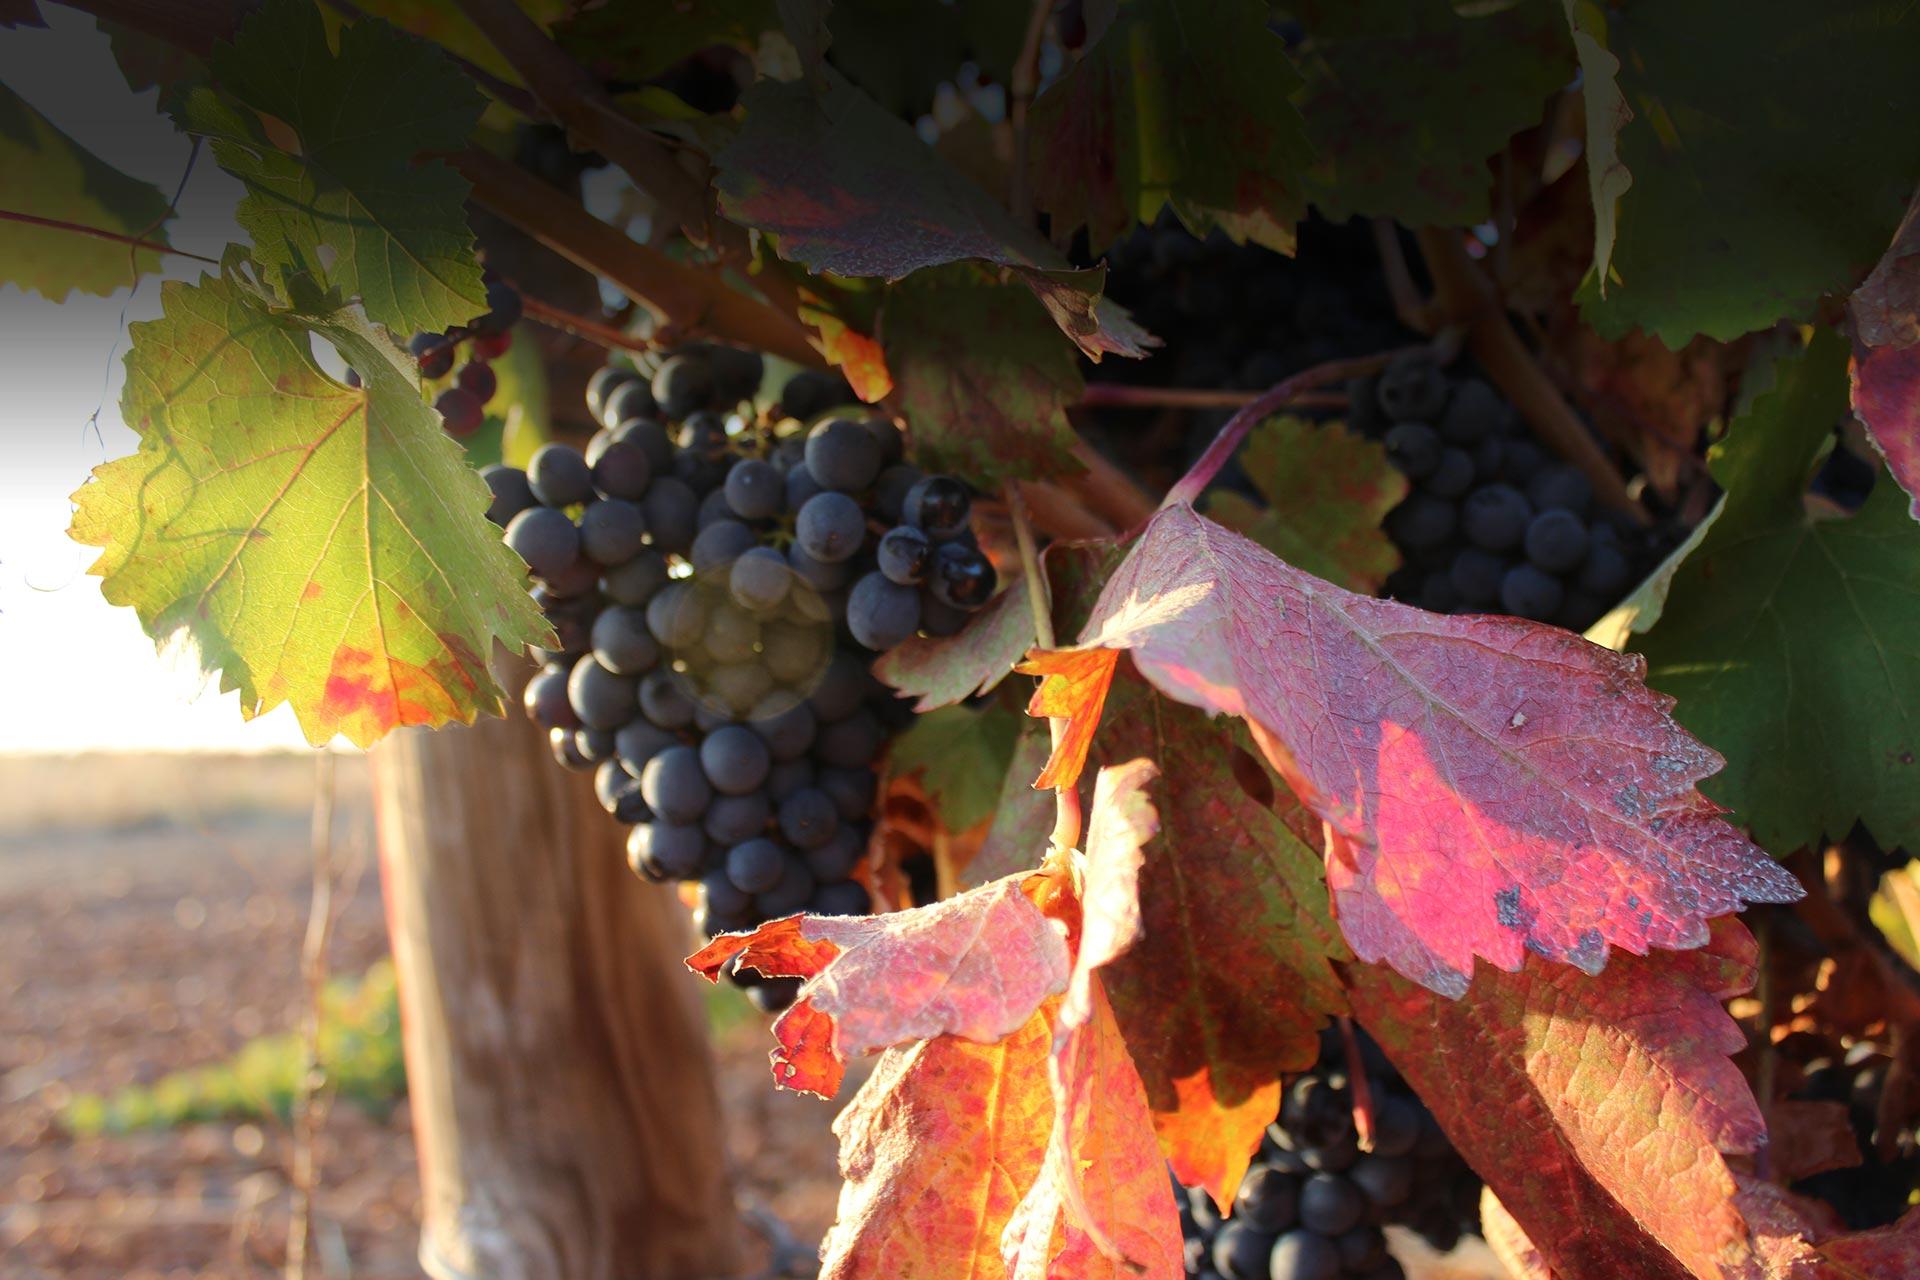 Bodegas Pelaez uvas